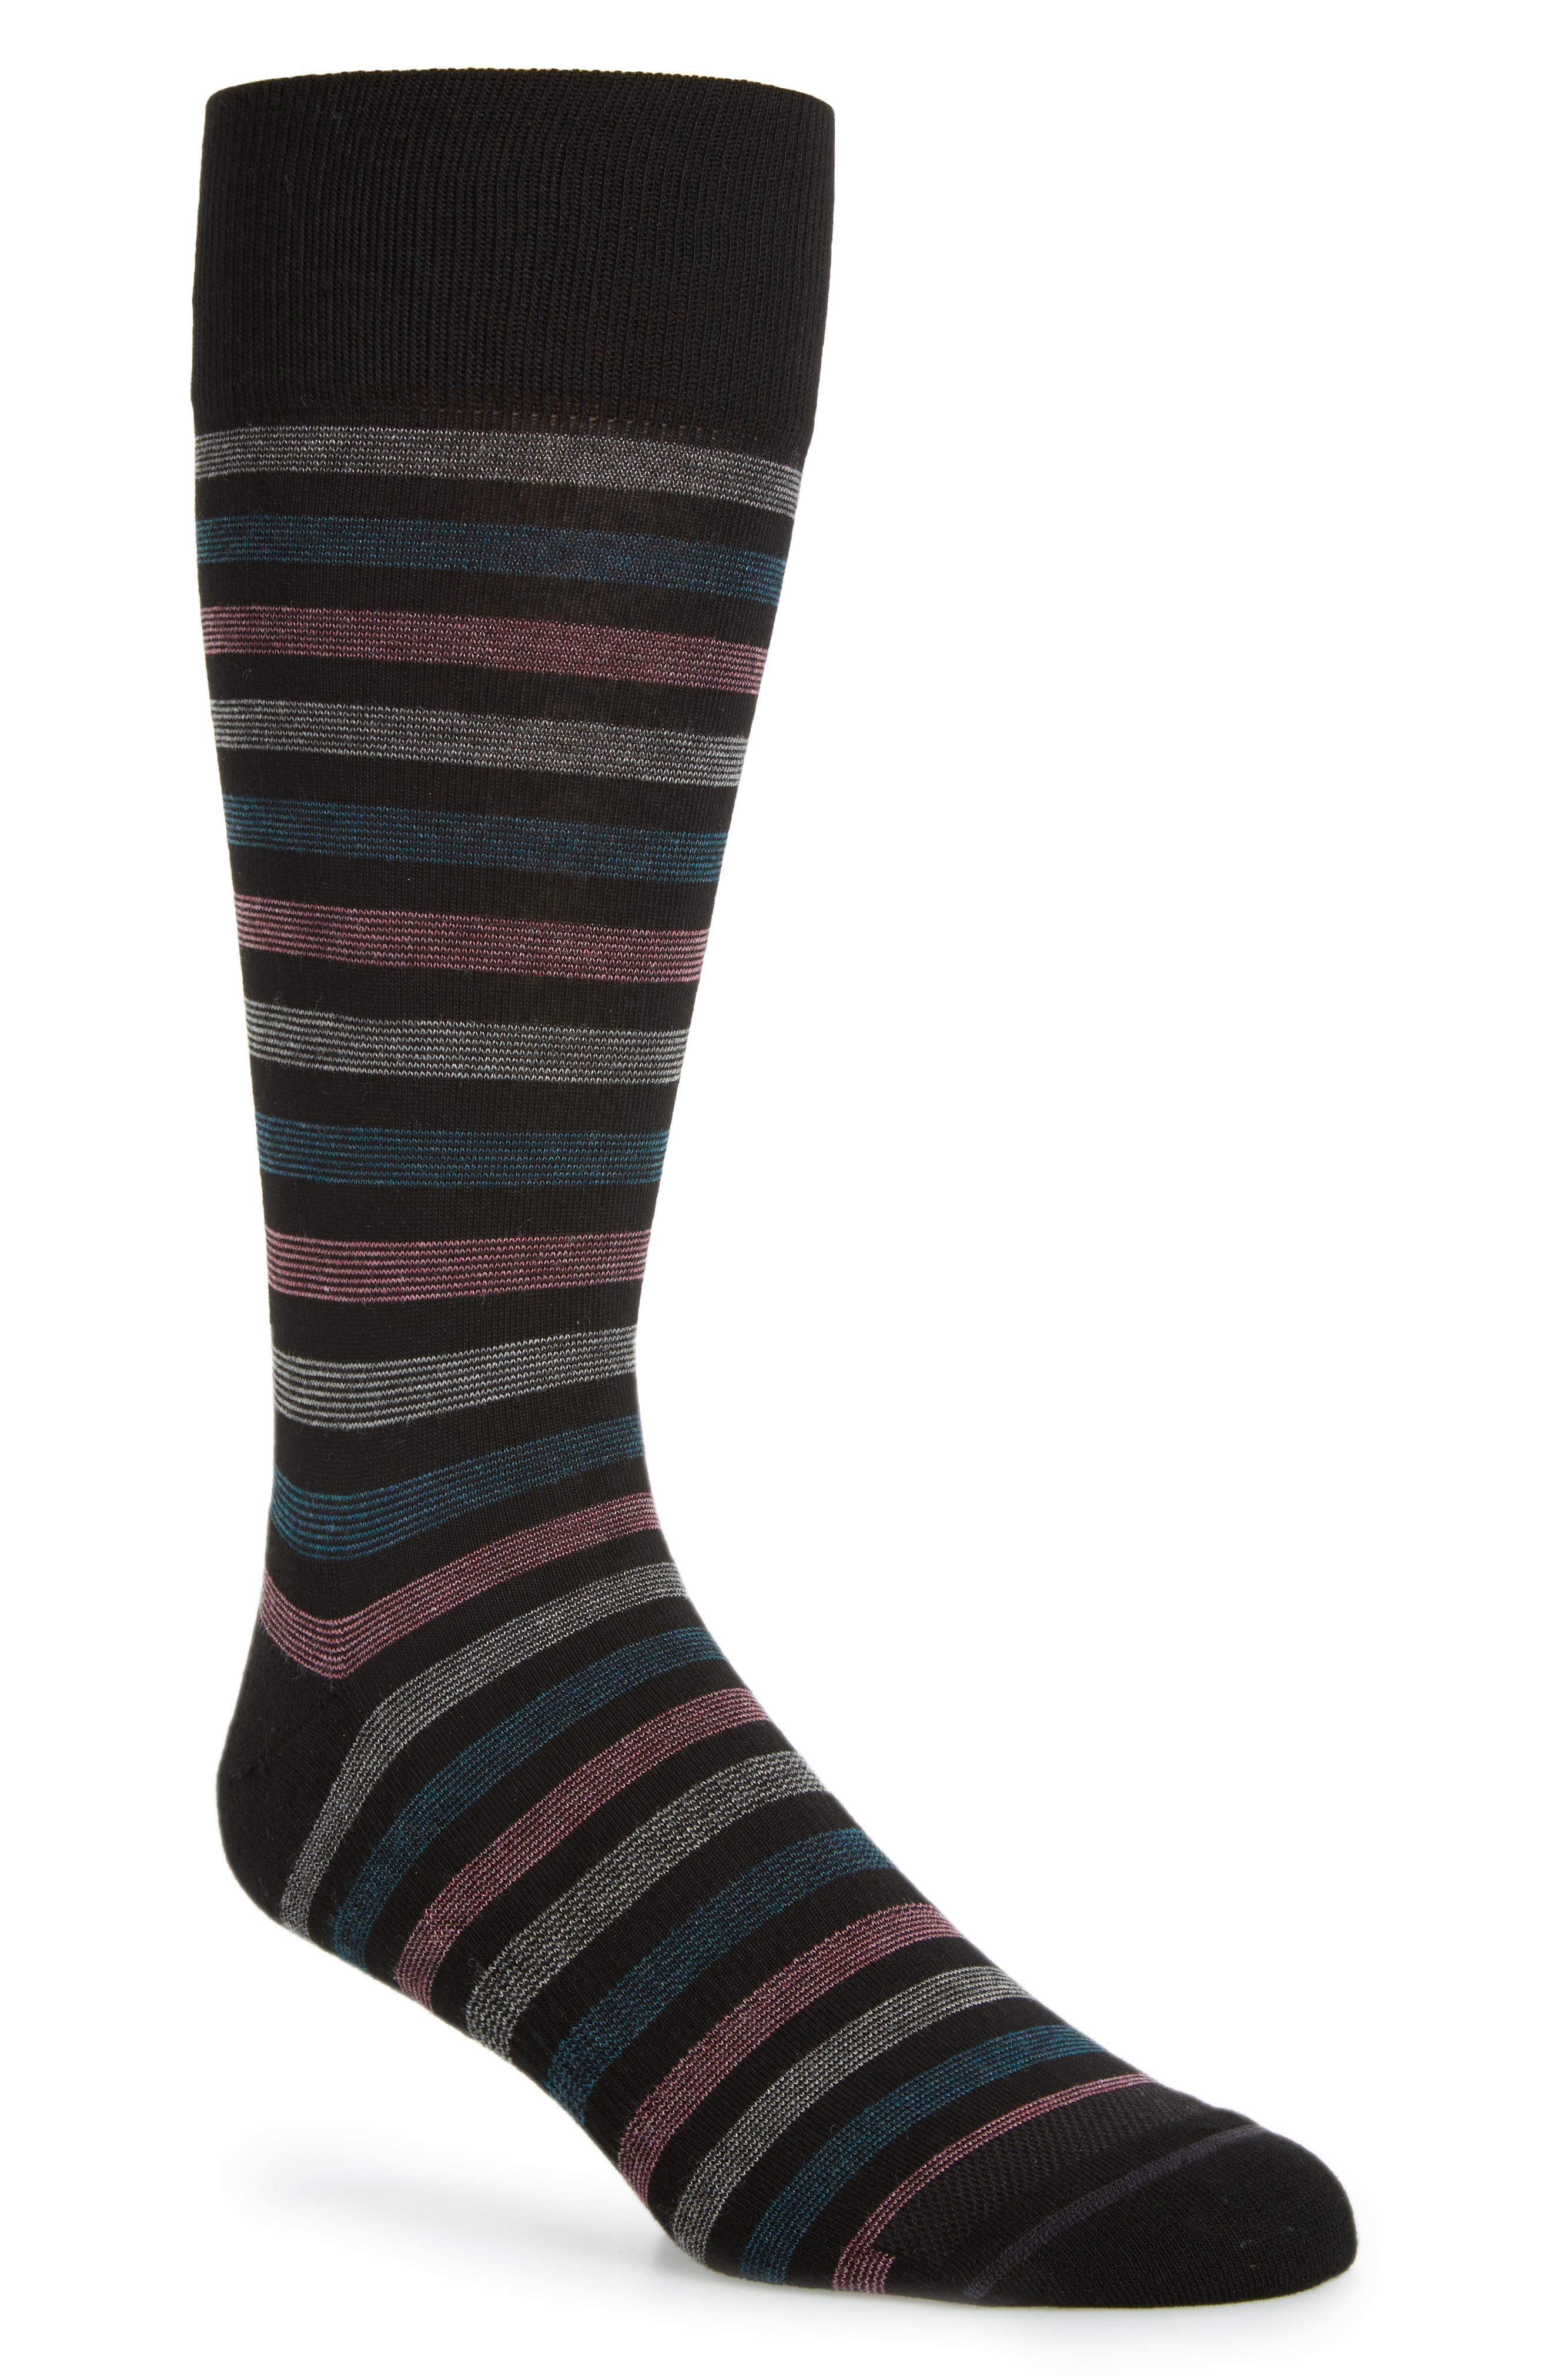 Nordstrom Men's Shop Multistripe Socks (3 for $30)